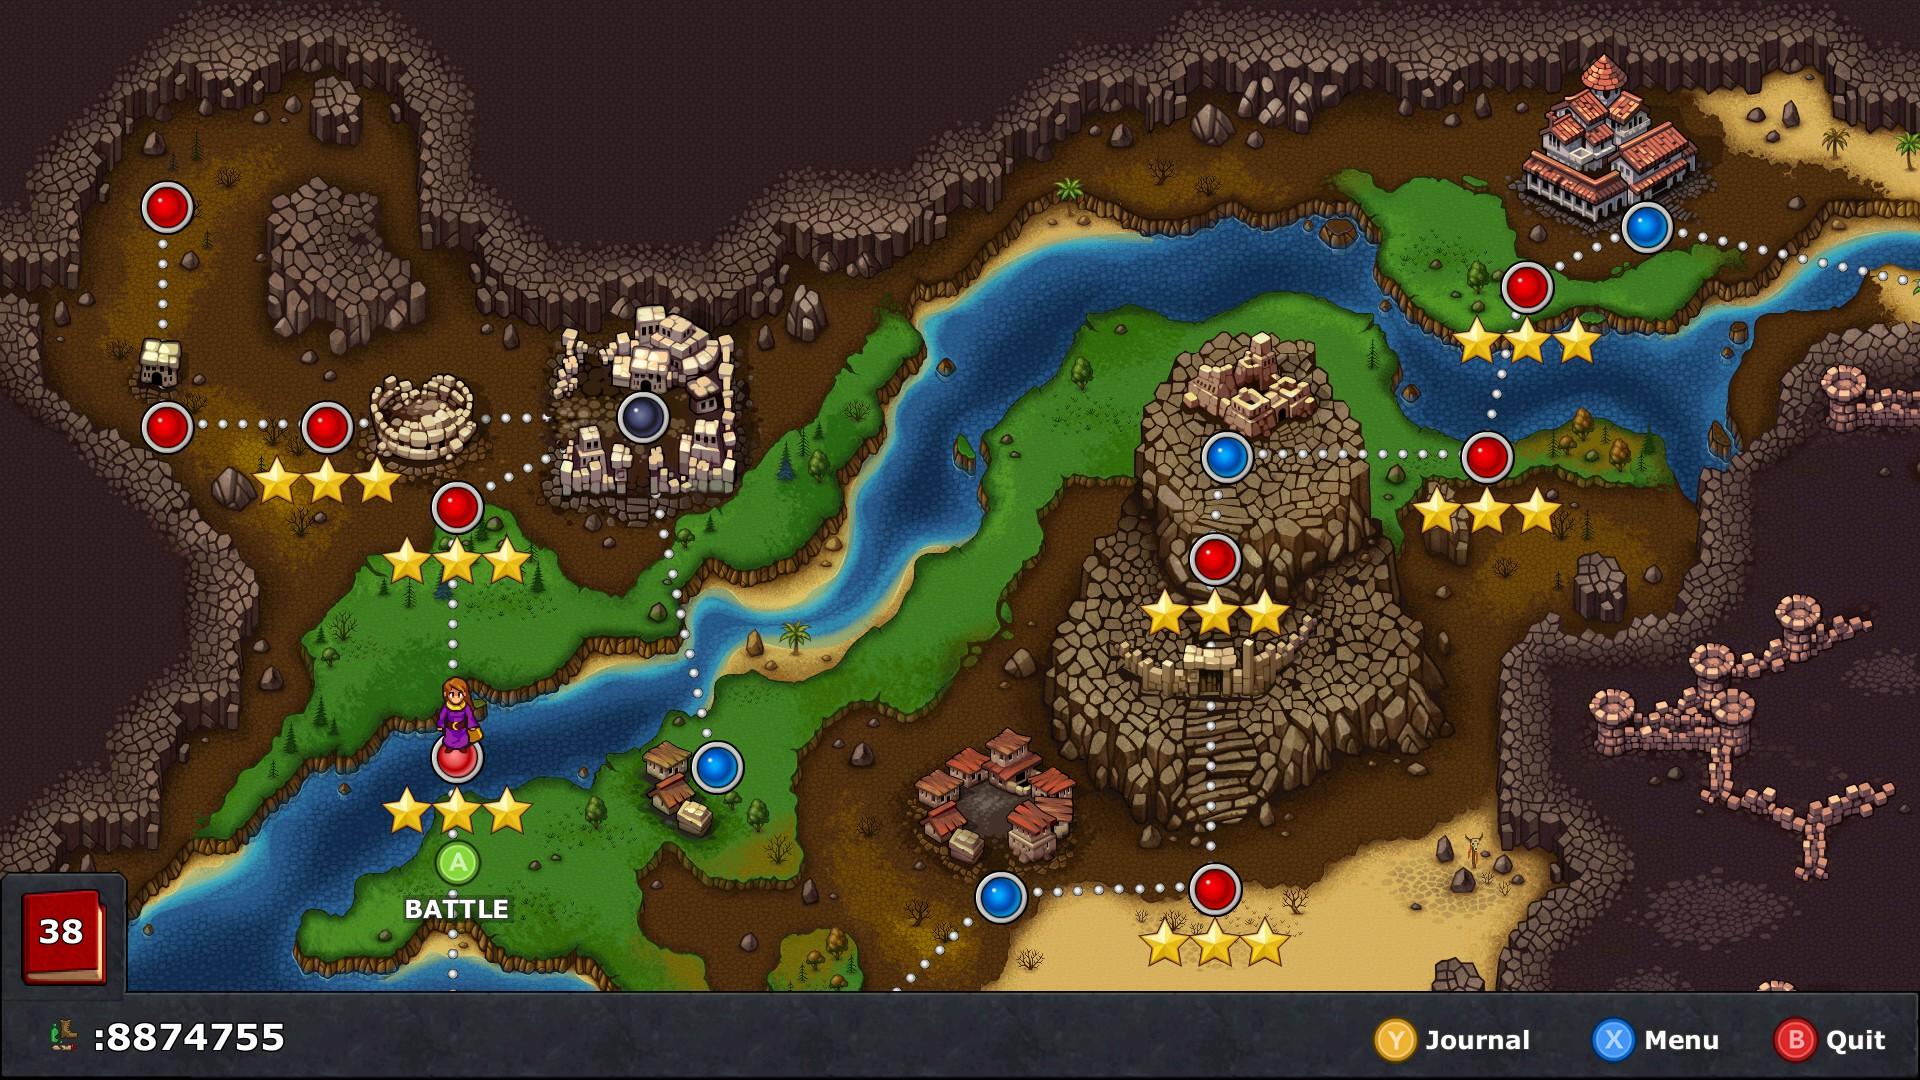 Overworld w/ Gamepad